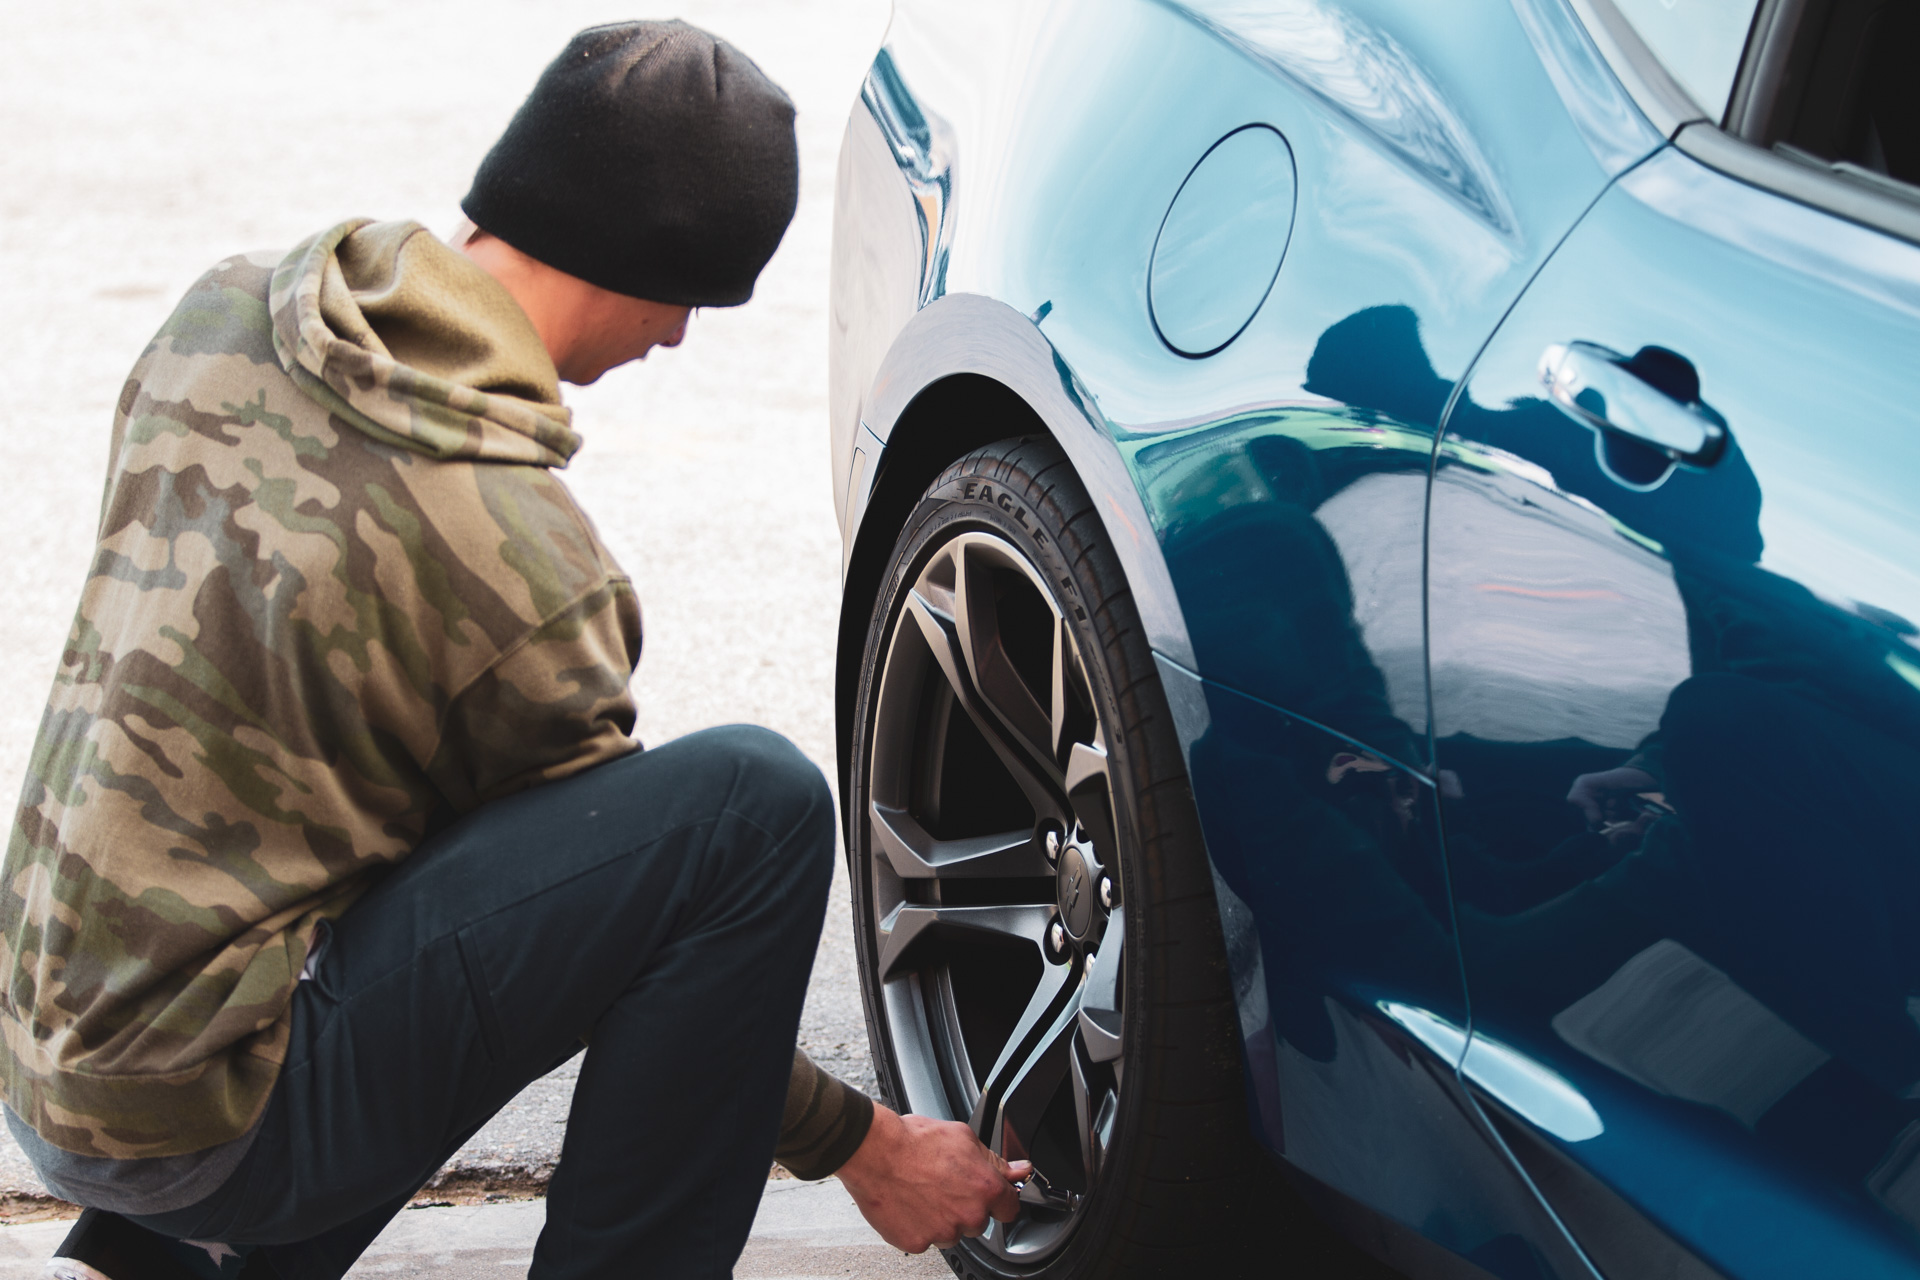 Bobby, BBi technician, checking tire pressures